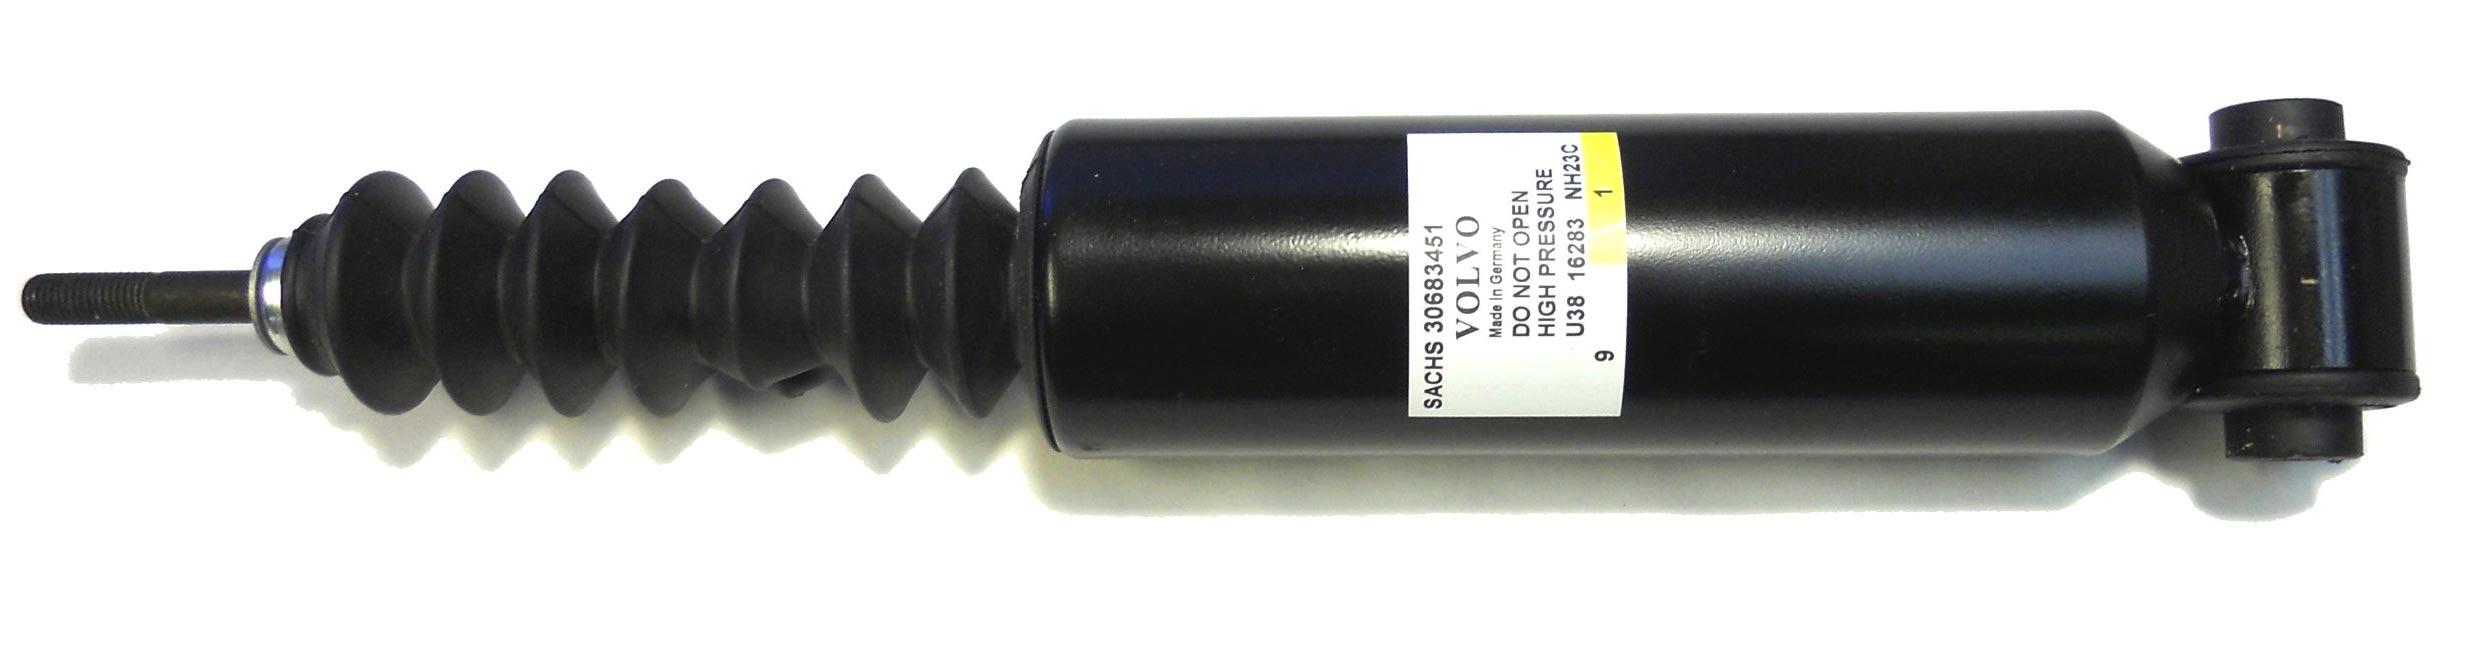 XC90 Nivomat Rear Shocks